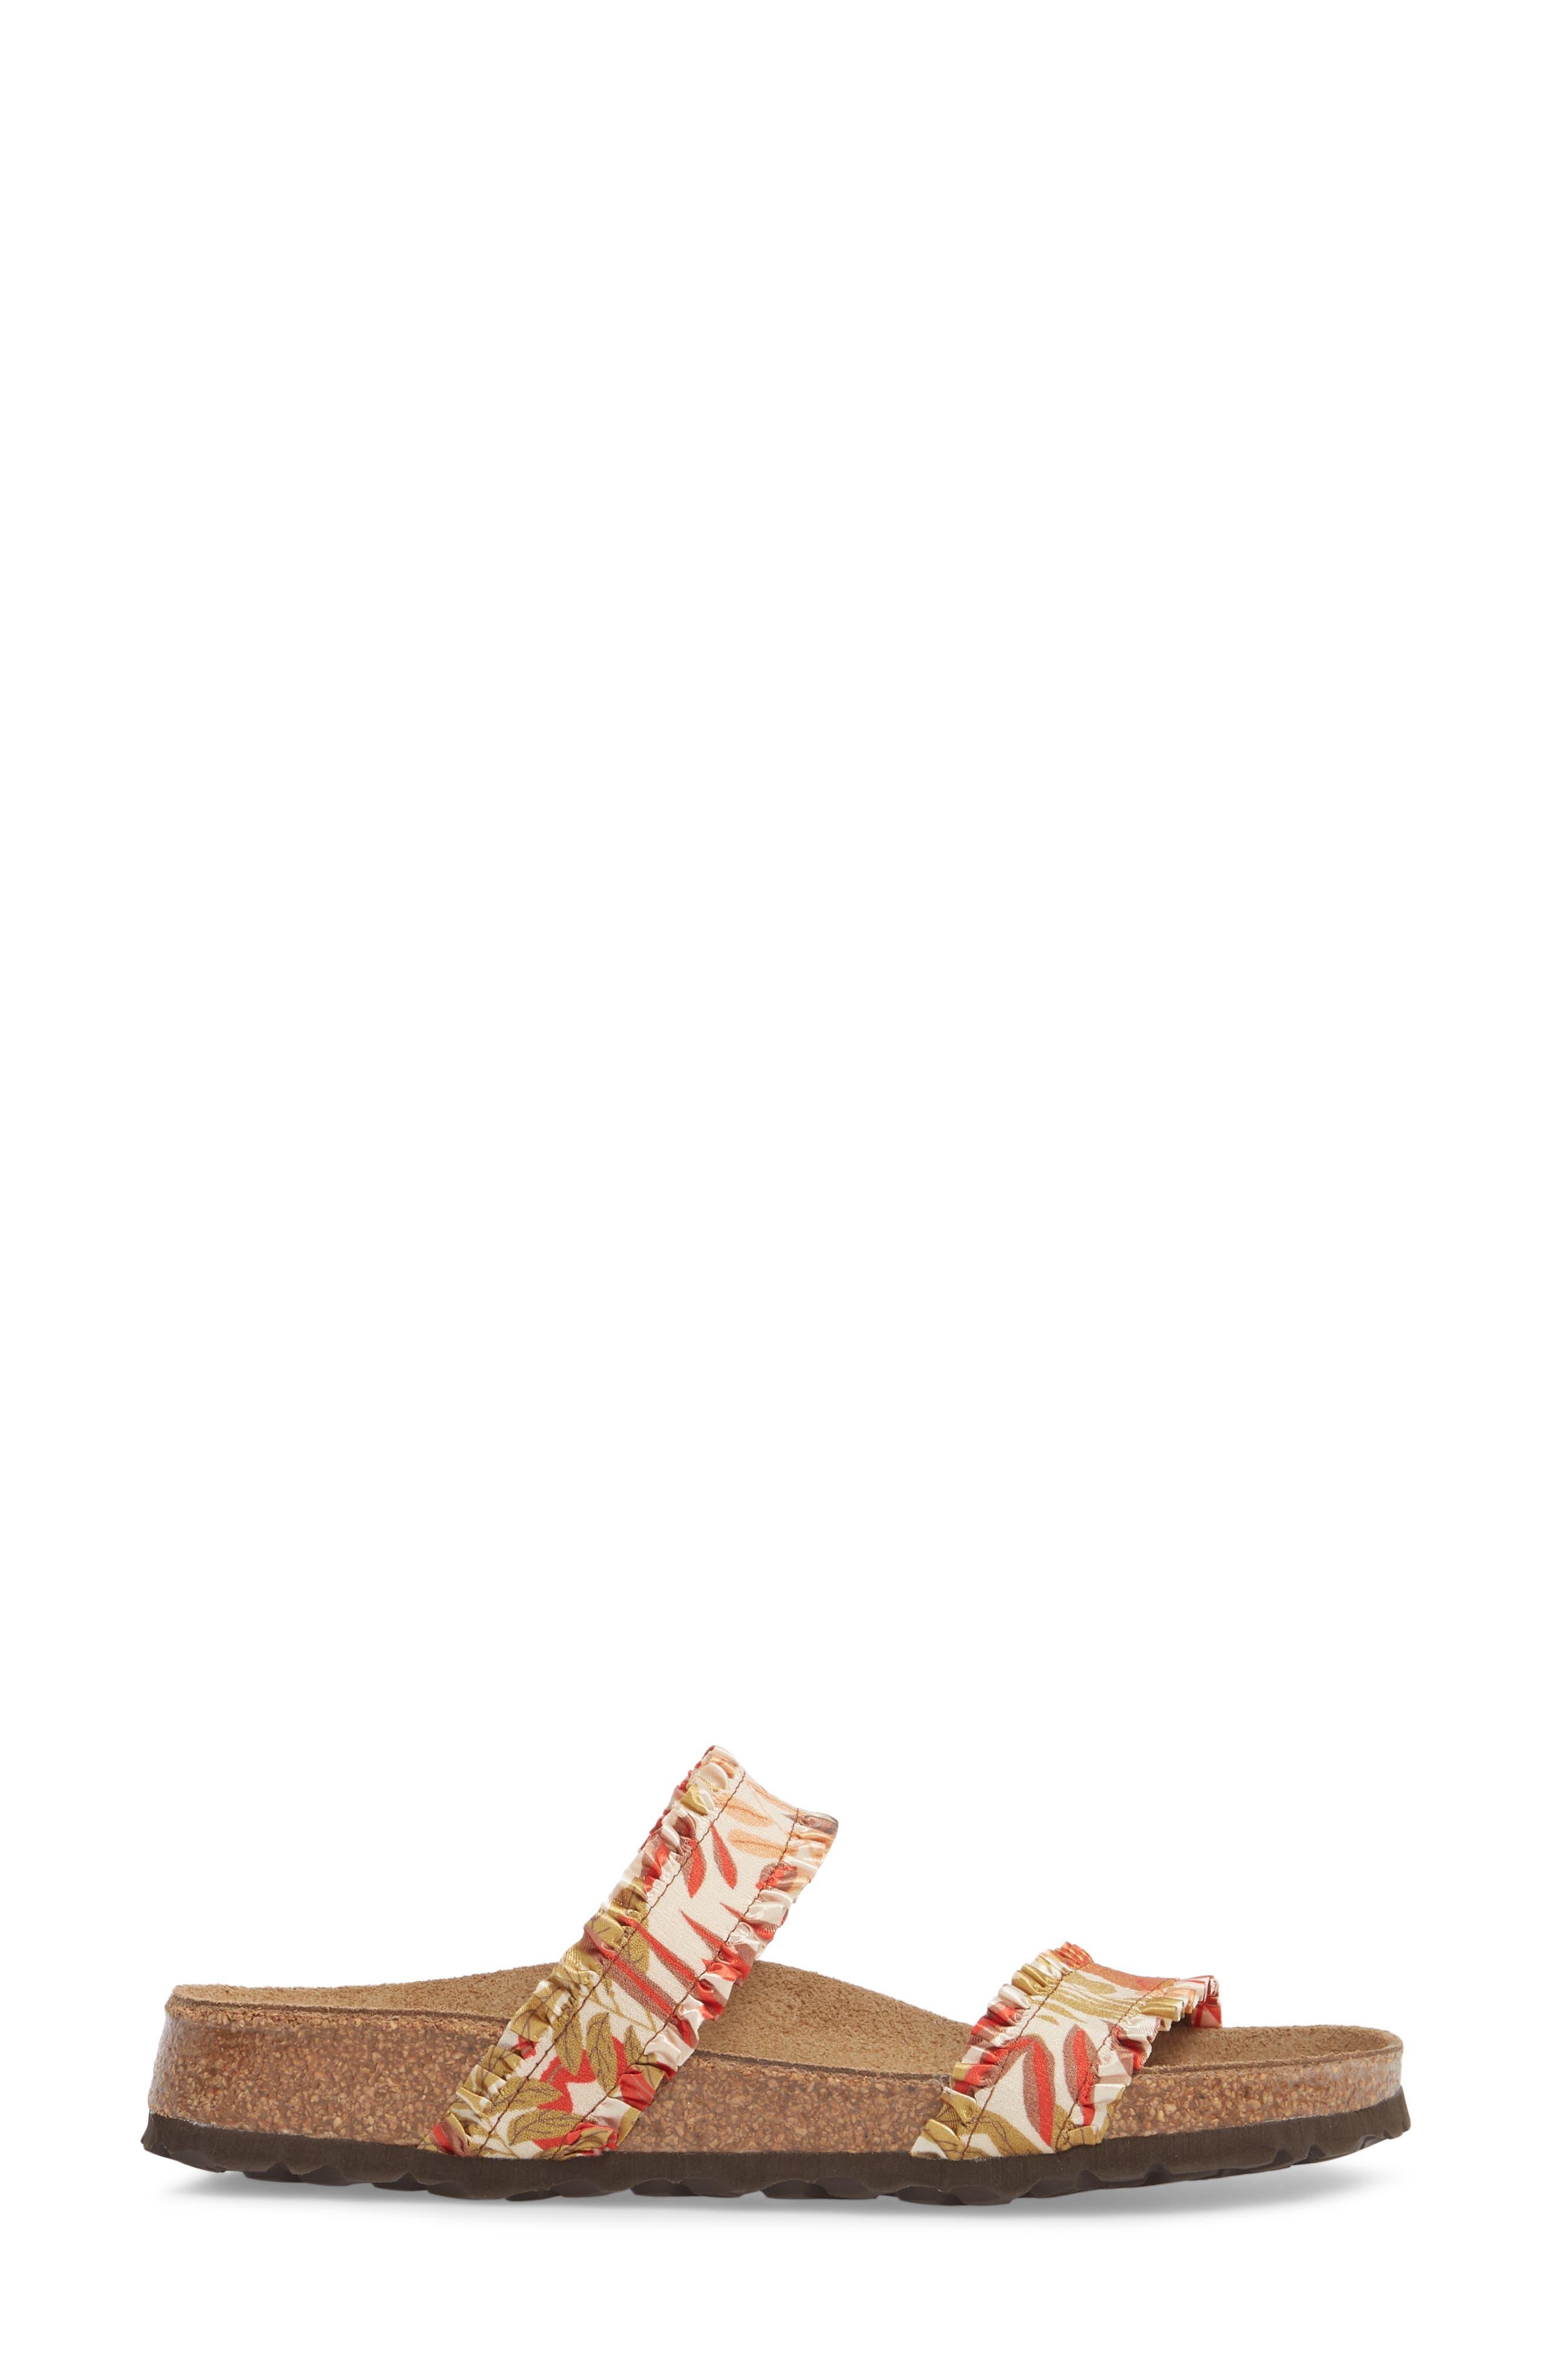 Papillio by Birkenstock Curacao Slide Sandal,                             Alternate thumbnail 3, color,                             Flower Frill Brown Fabric